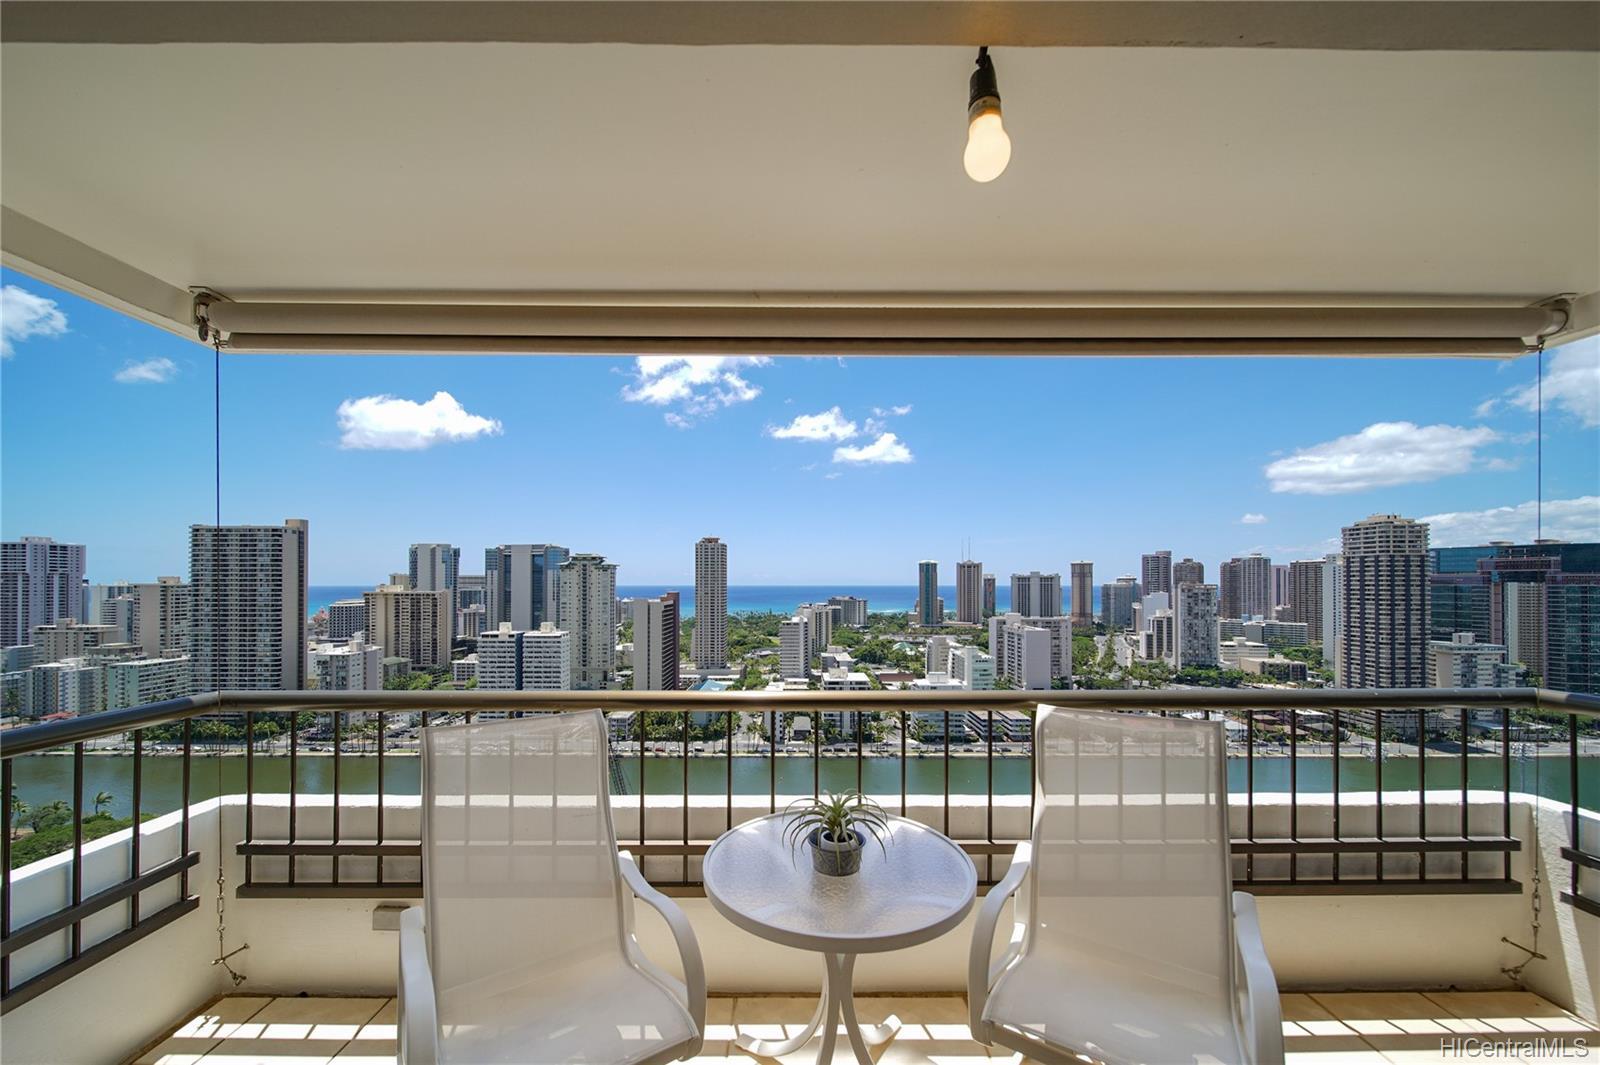 MARCO POLO APTS condo # 2909, Honolulu, Hawaii - photo 6 of 25